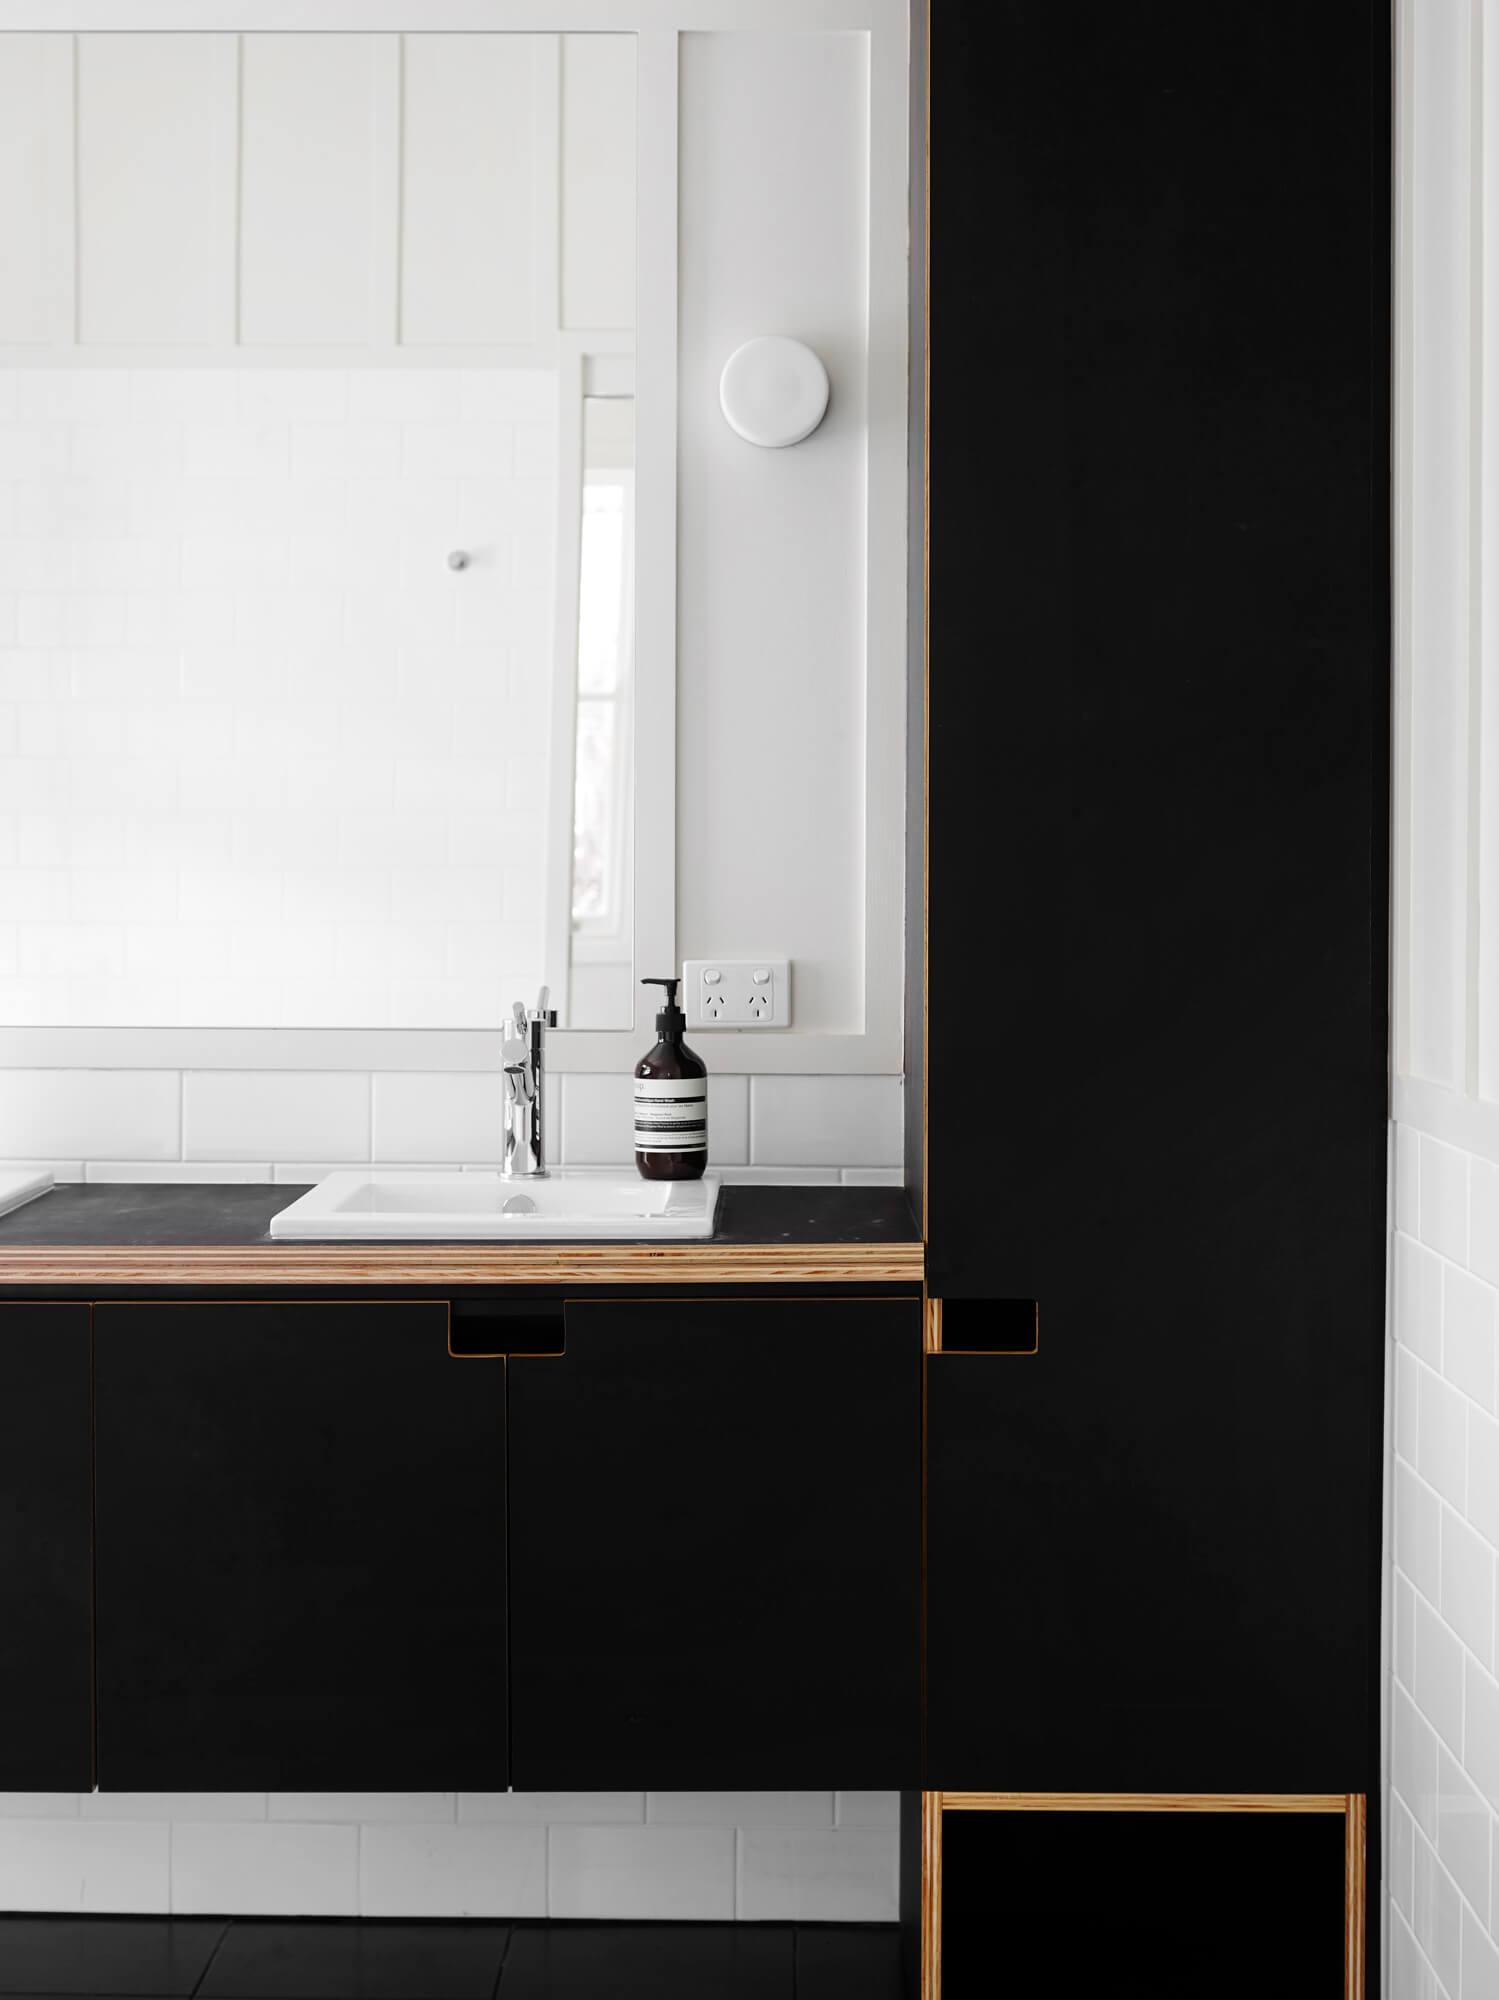 georgia-cannon-interior-designer-brisbane-project-m2-house-017112.jpg